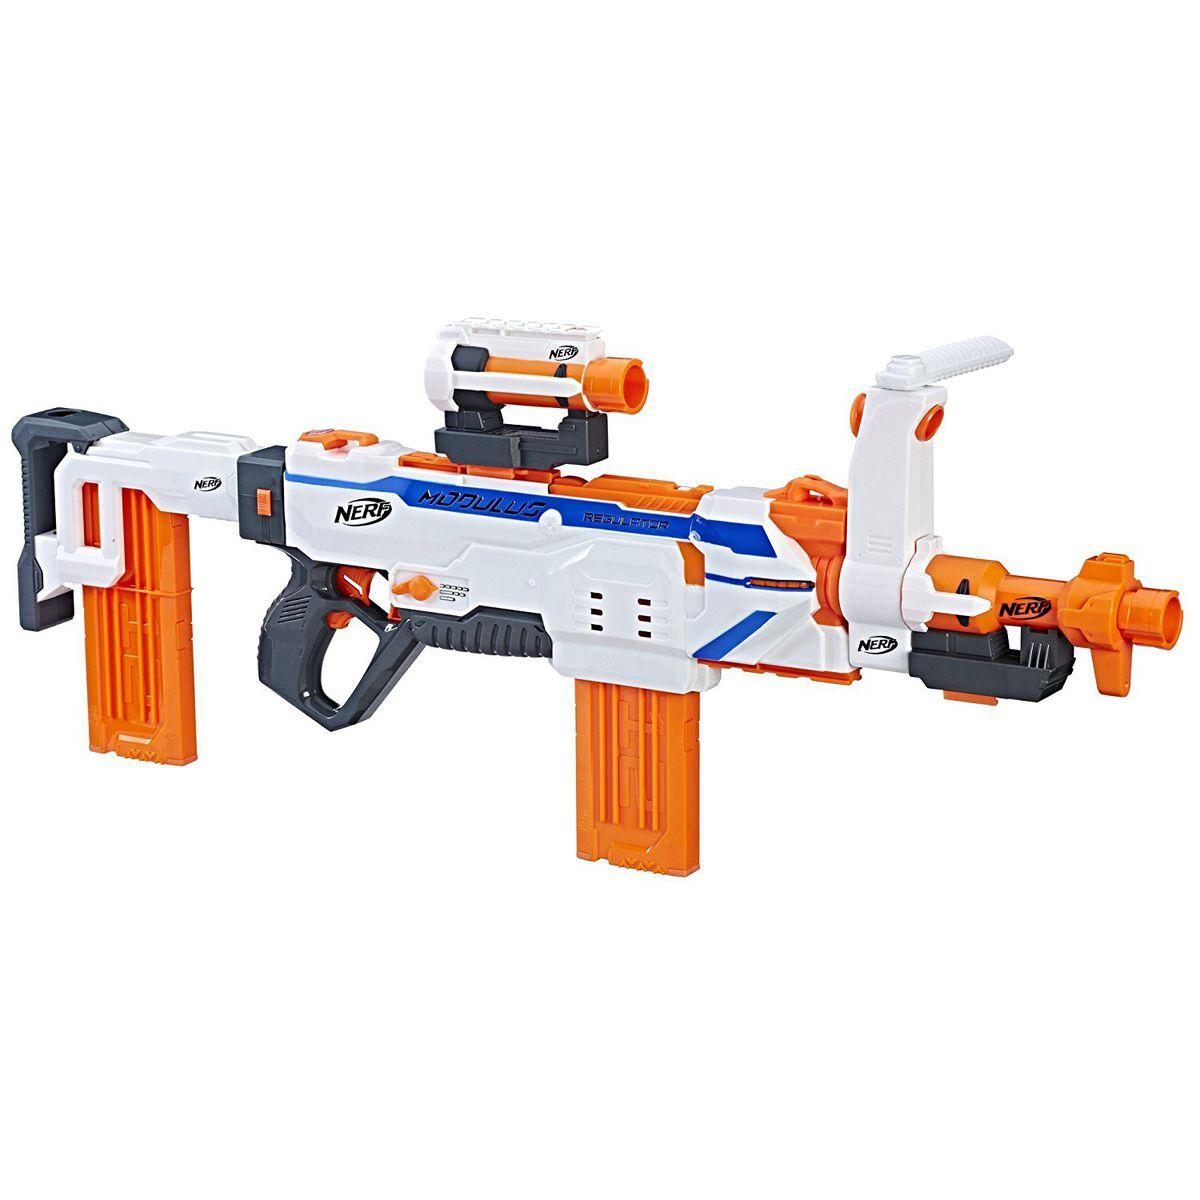 Nerf Gun Modulus Regulator Boys Toy - Parallel Import | Buy Online in South  Africa | takealot.com